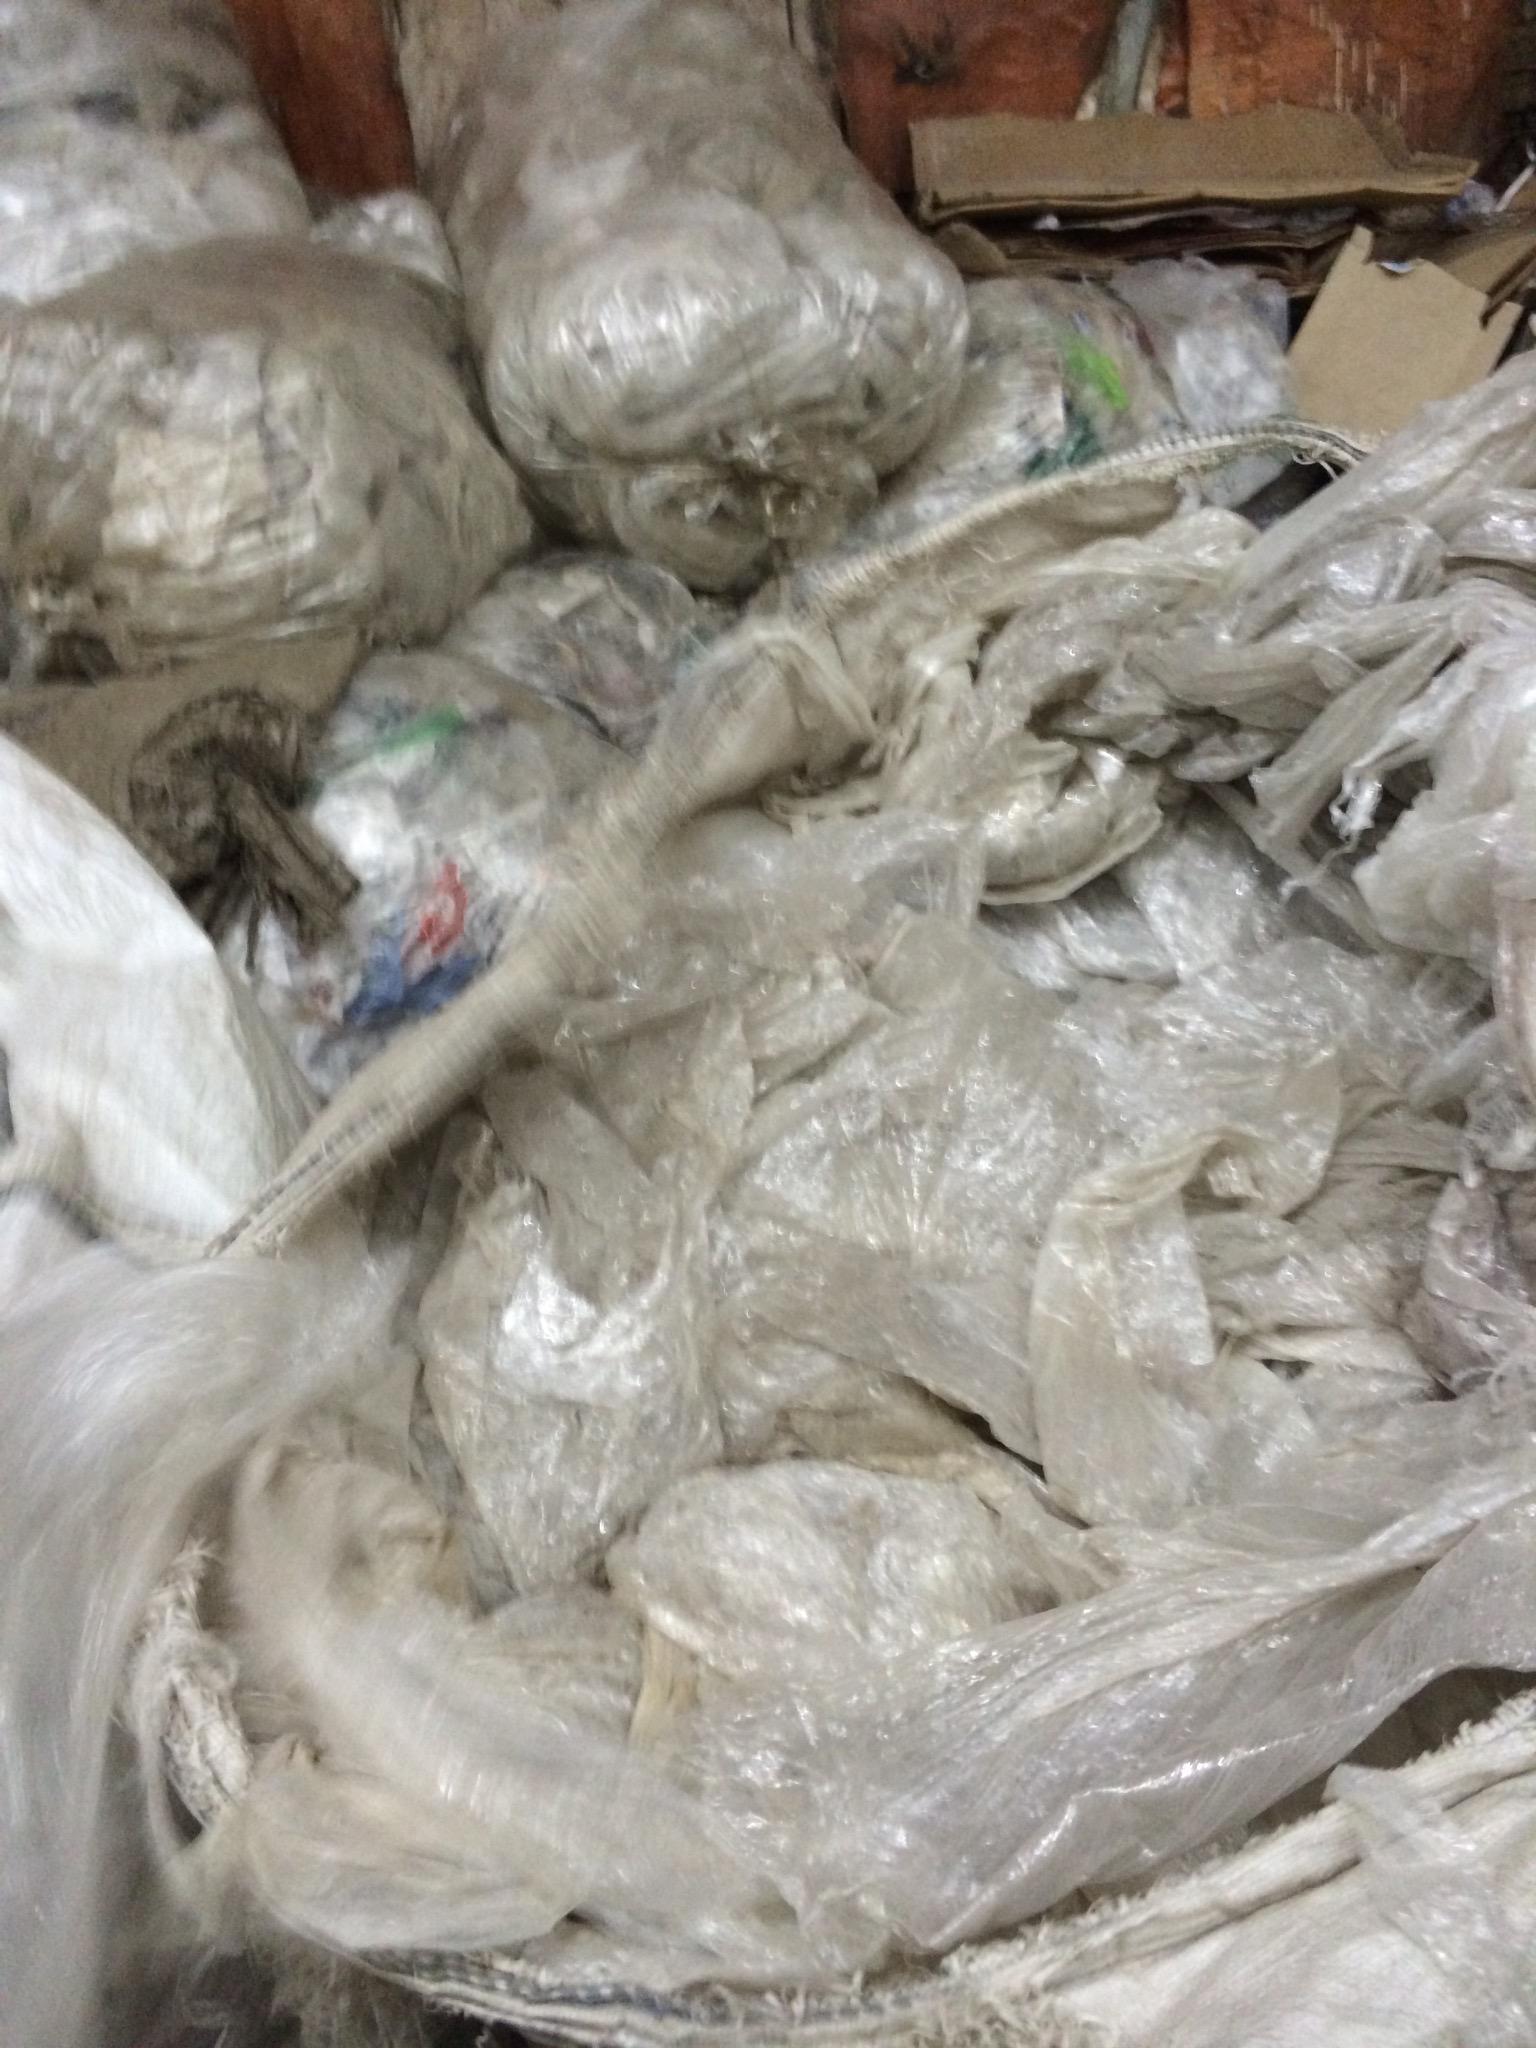 переработка отходов пластика